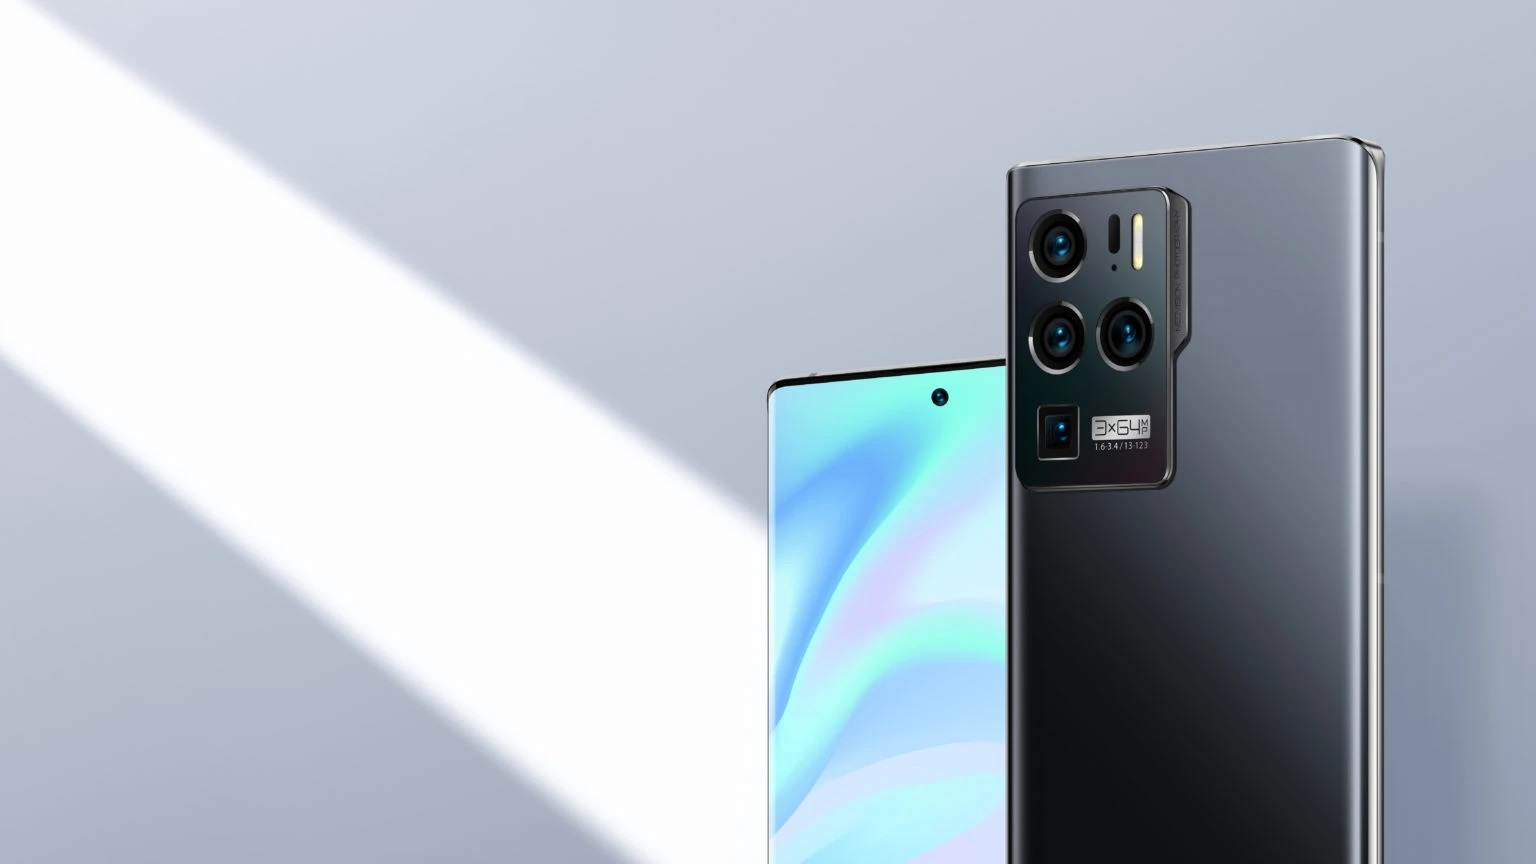 ZTE رسما از گوشی Axon 30 Ultra 5G با سه دوربین 64 مگاپیکسلی رونمایی کرد